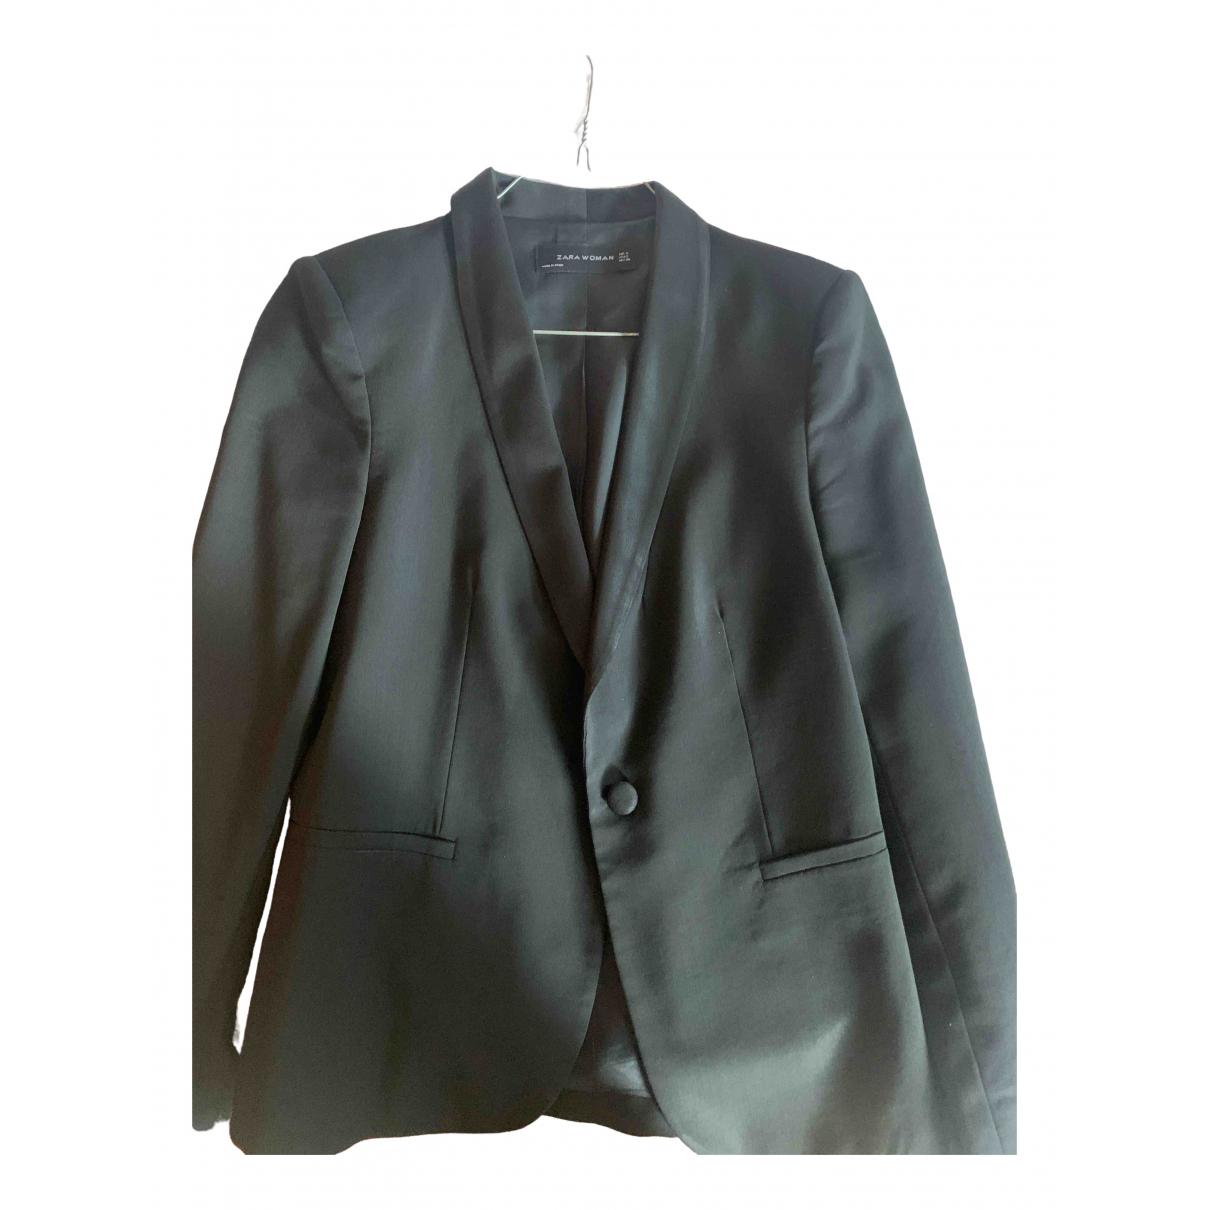 Zara \N Black jacket for Women 36 FR